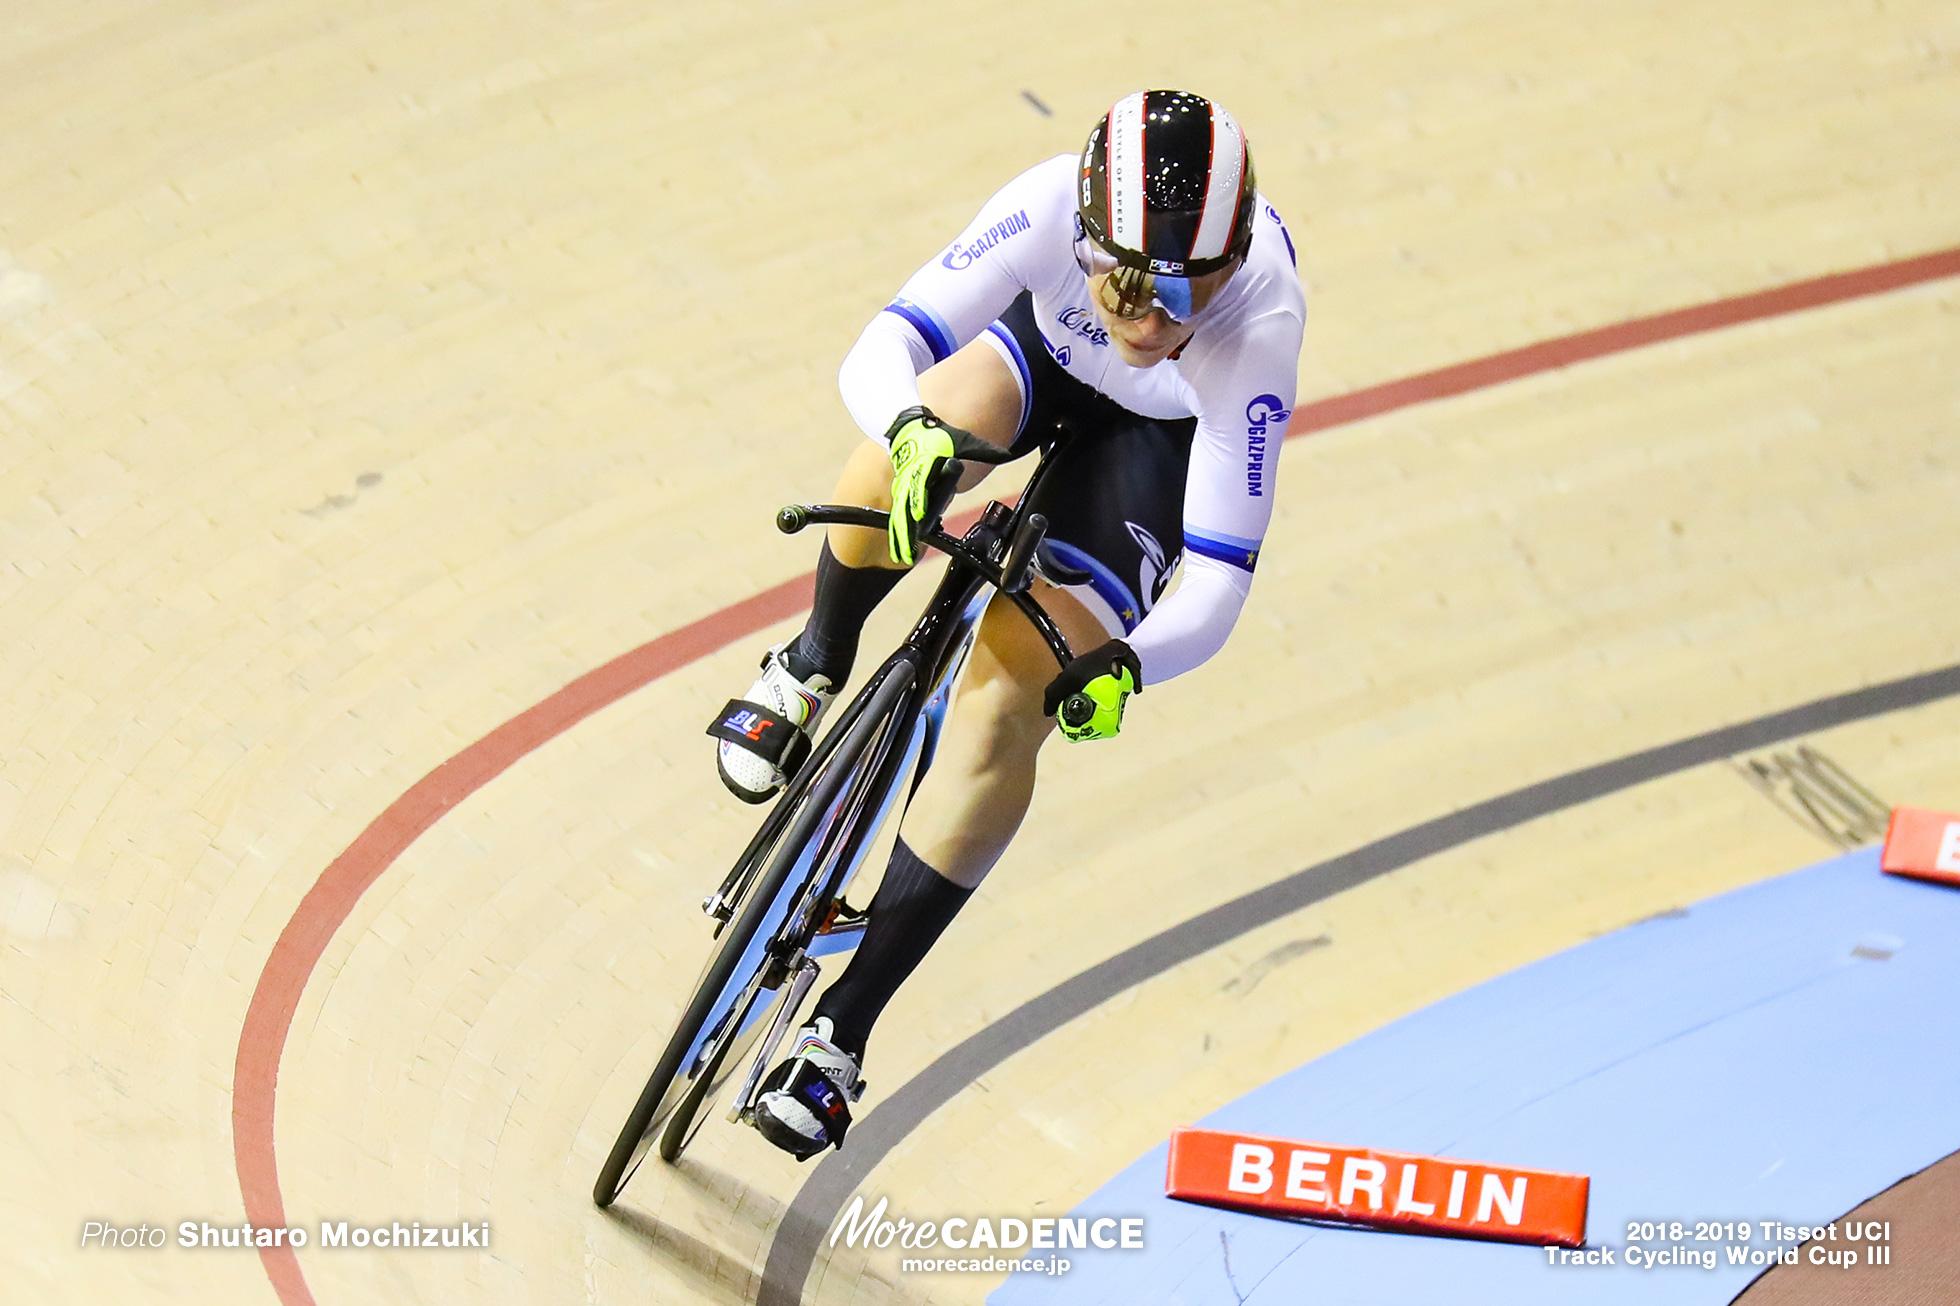 Women's 500mTT/Final/2018-2019 Track Cycling World Cup III Berlin